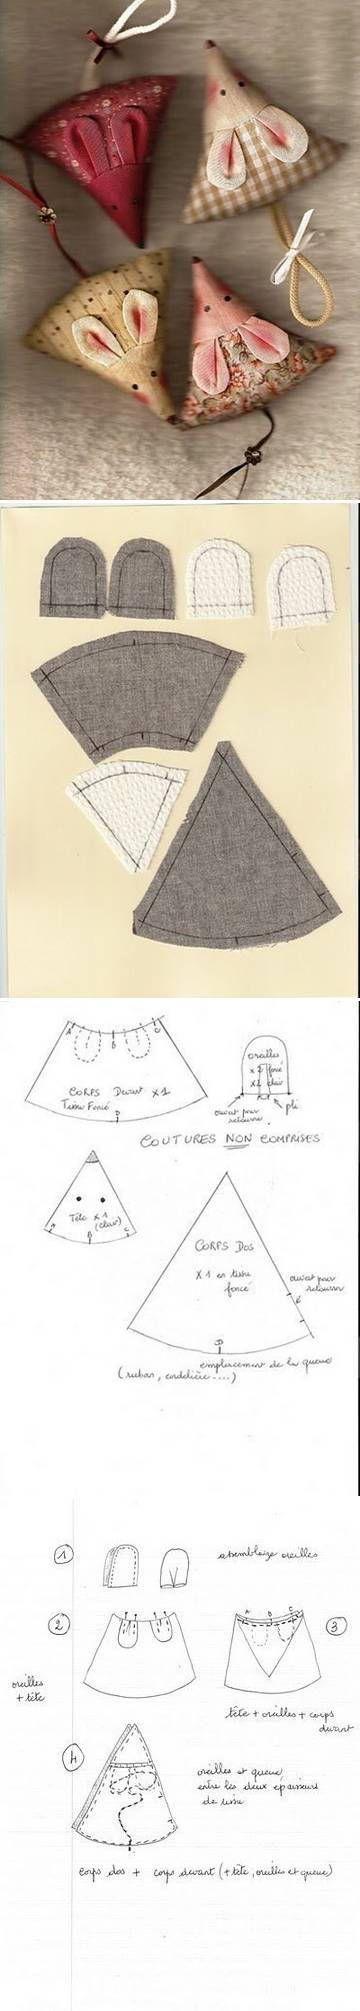 DIY Cute Fabric Mice DIY Projects   UsefulDIY.com Follow Us on ...